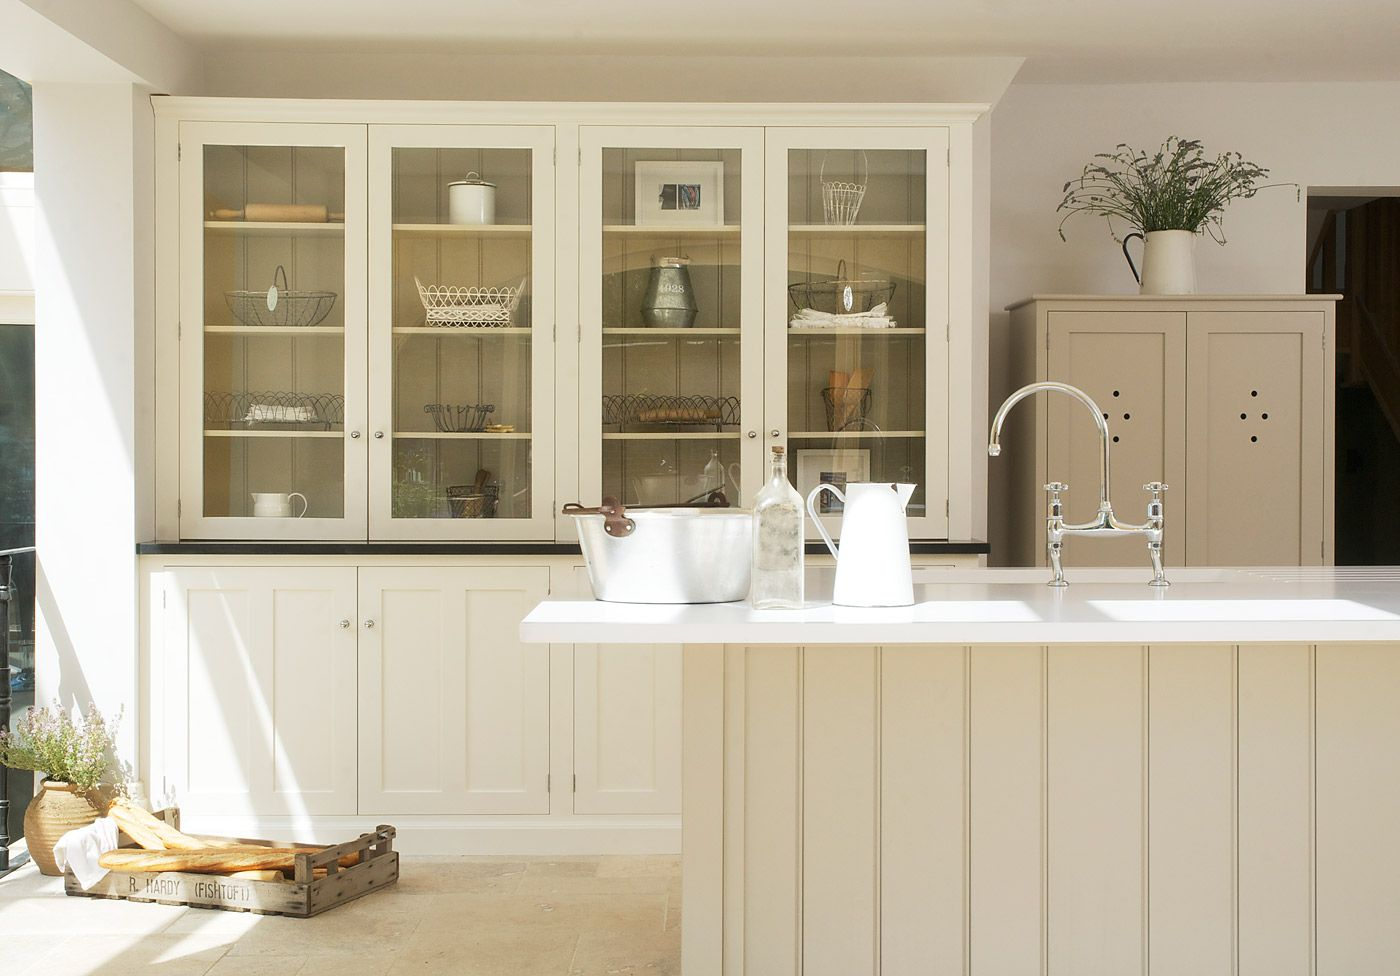 Shaker Kitchens Fullscreen Gallery - deVOL Kitchens | Handmade ...